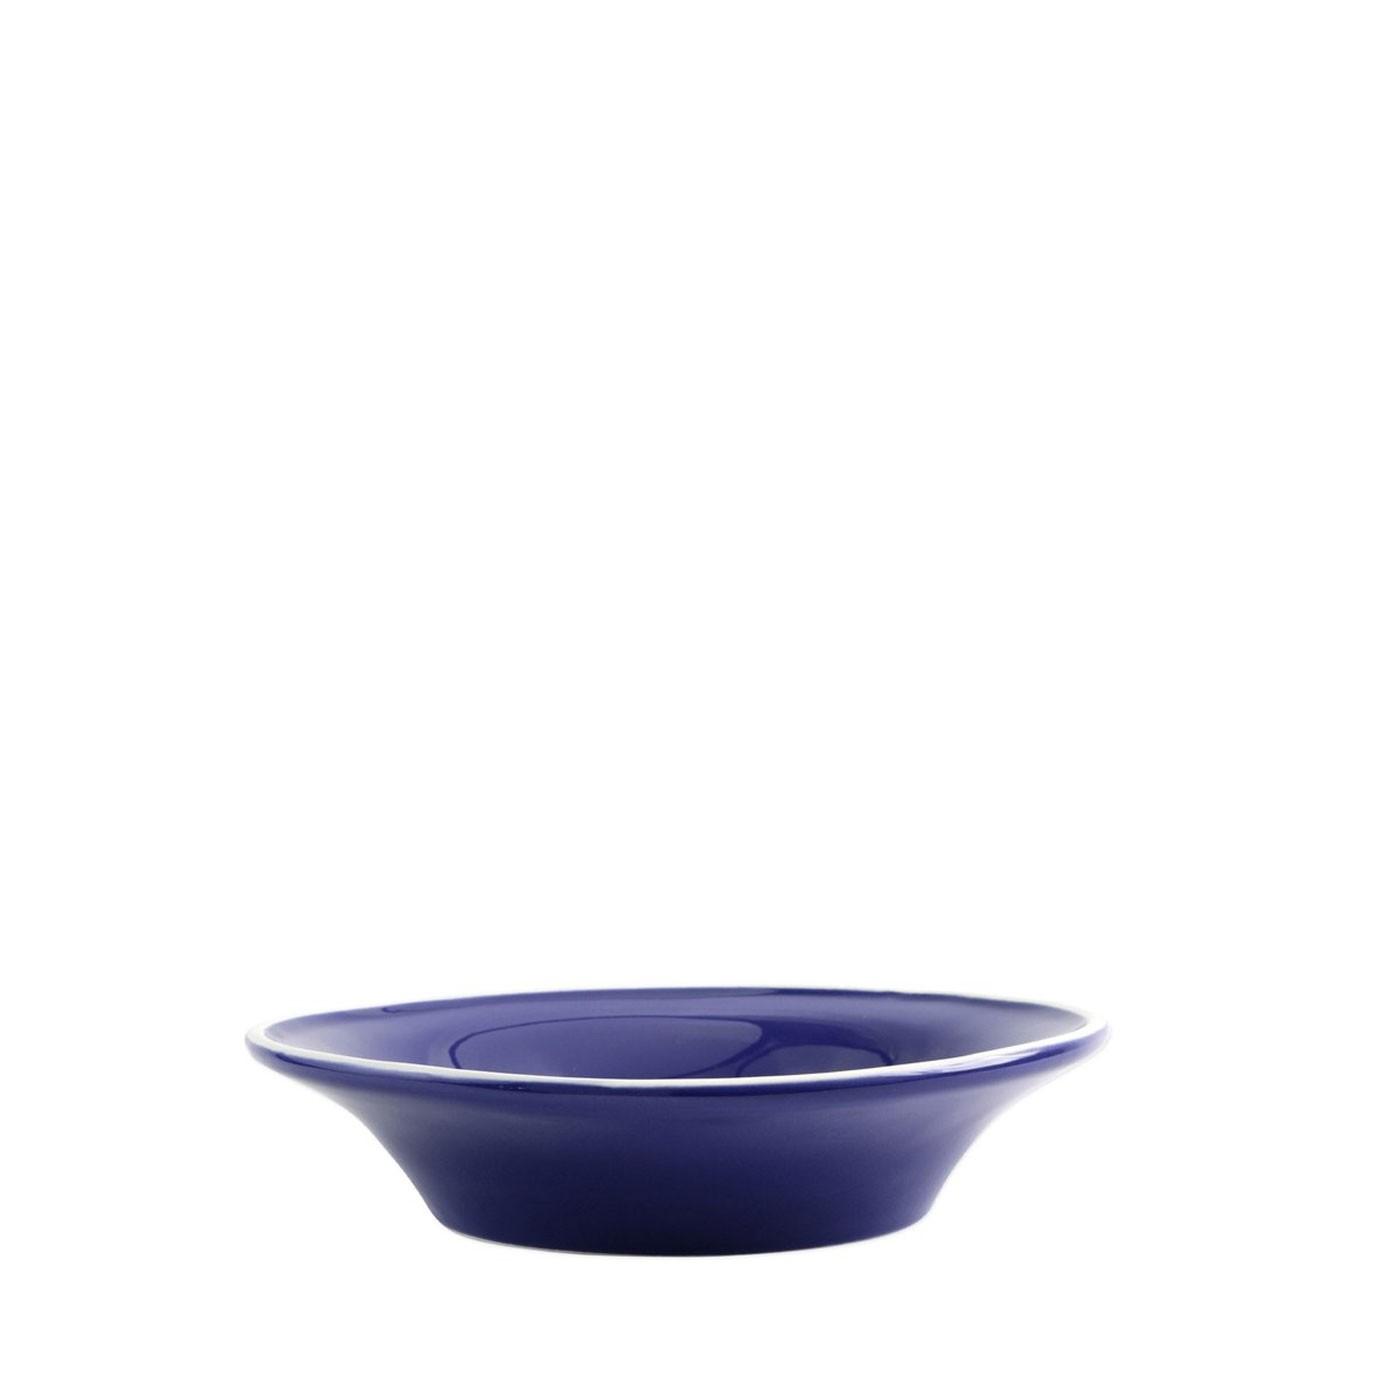 Chroma Blue Pasta Bowl